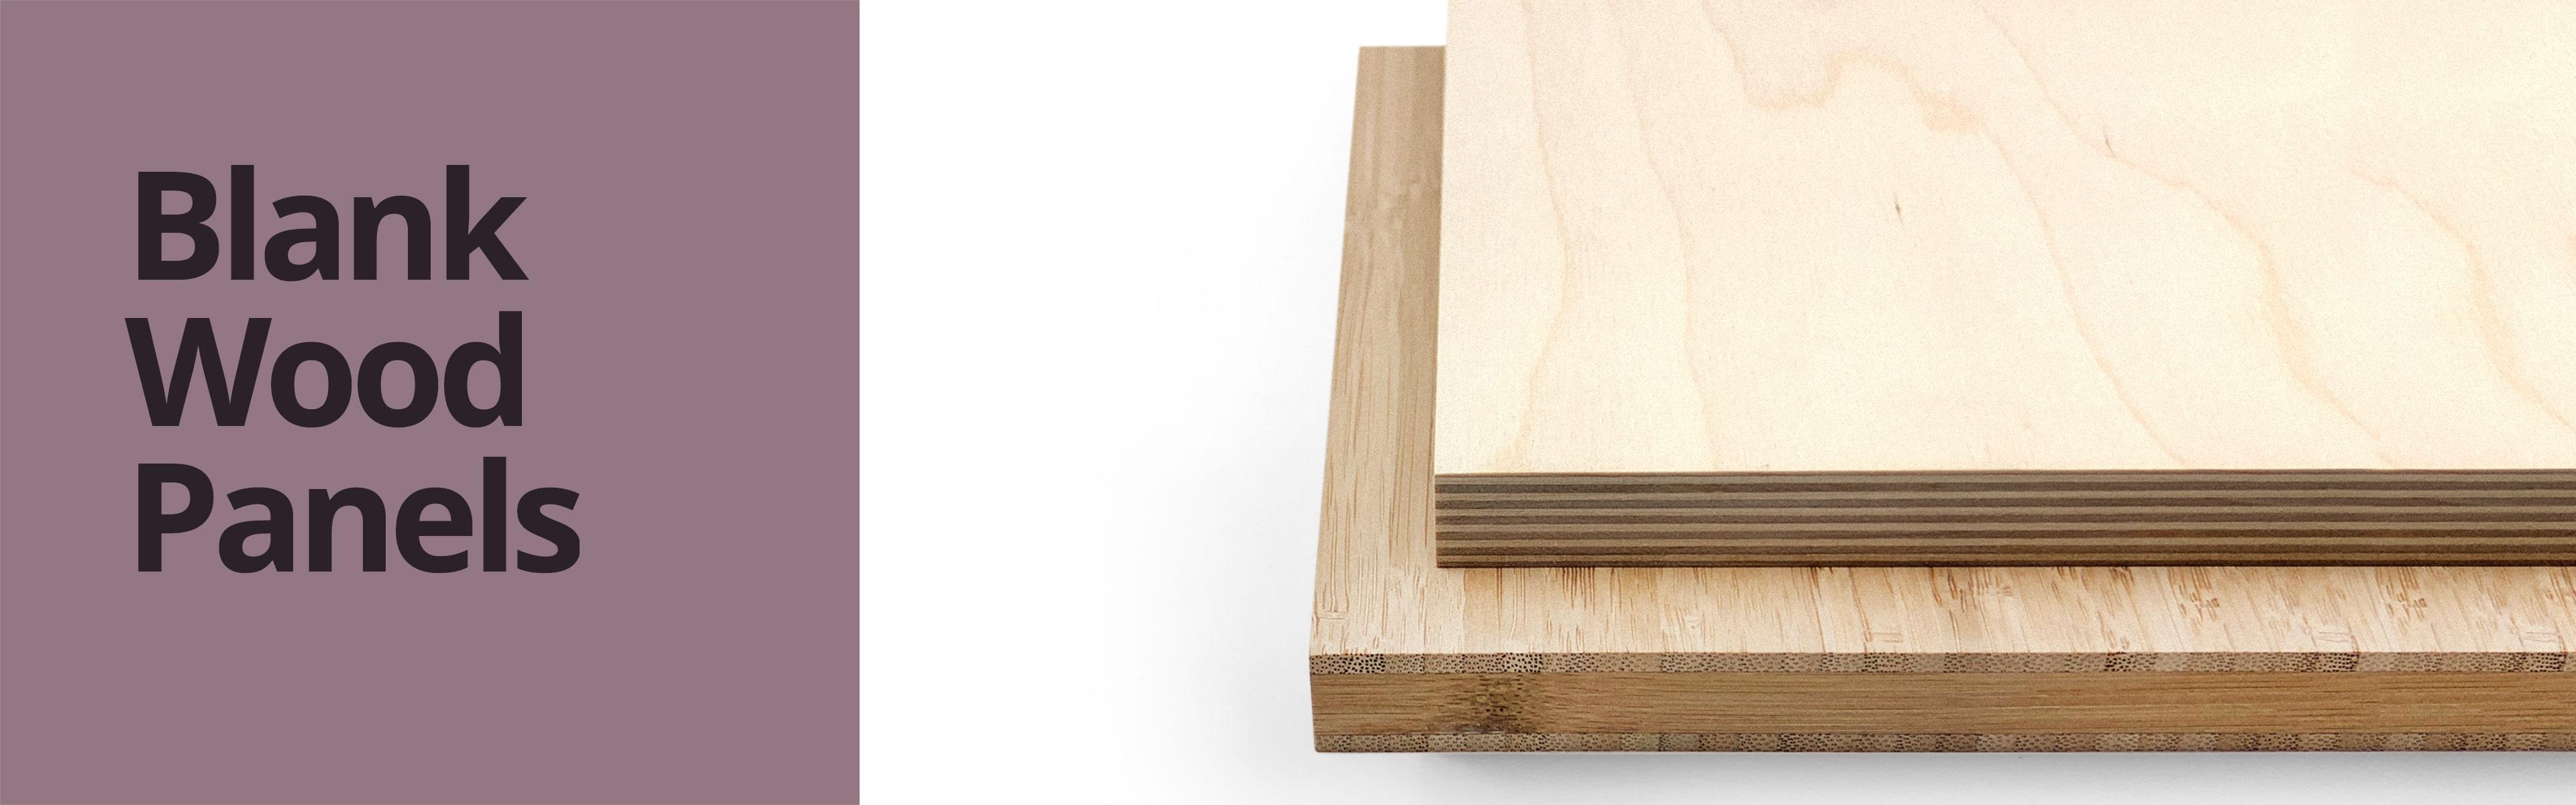 Blank Wood Panels